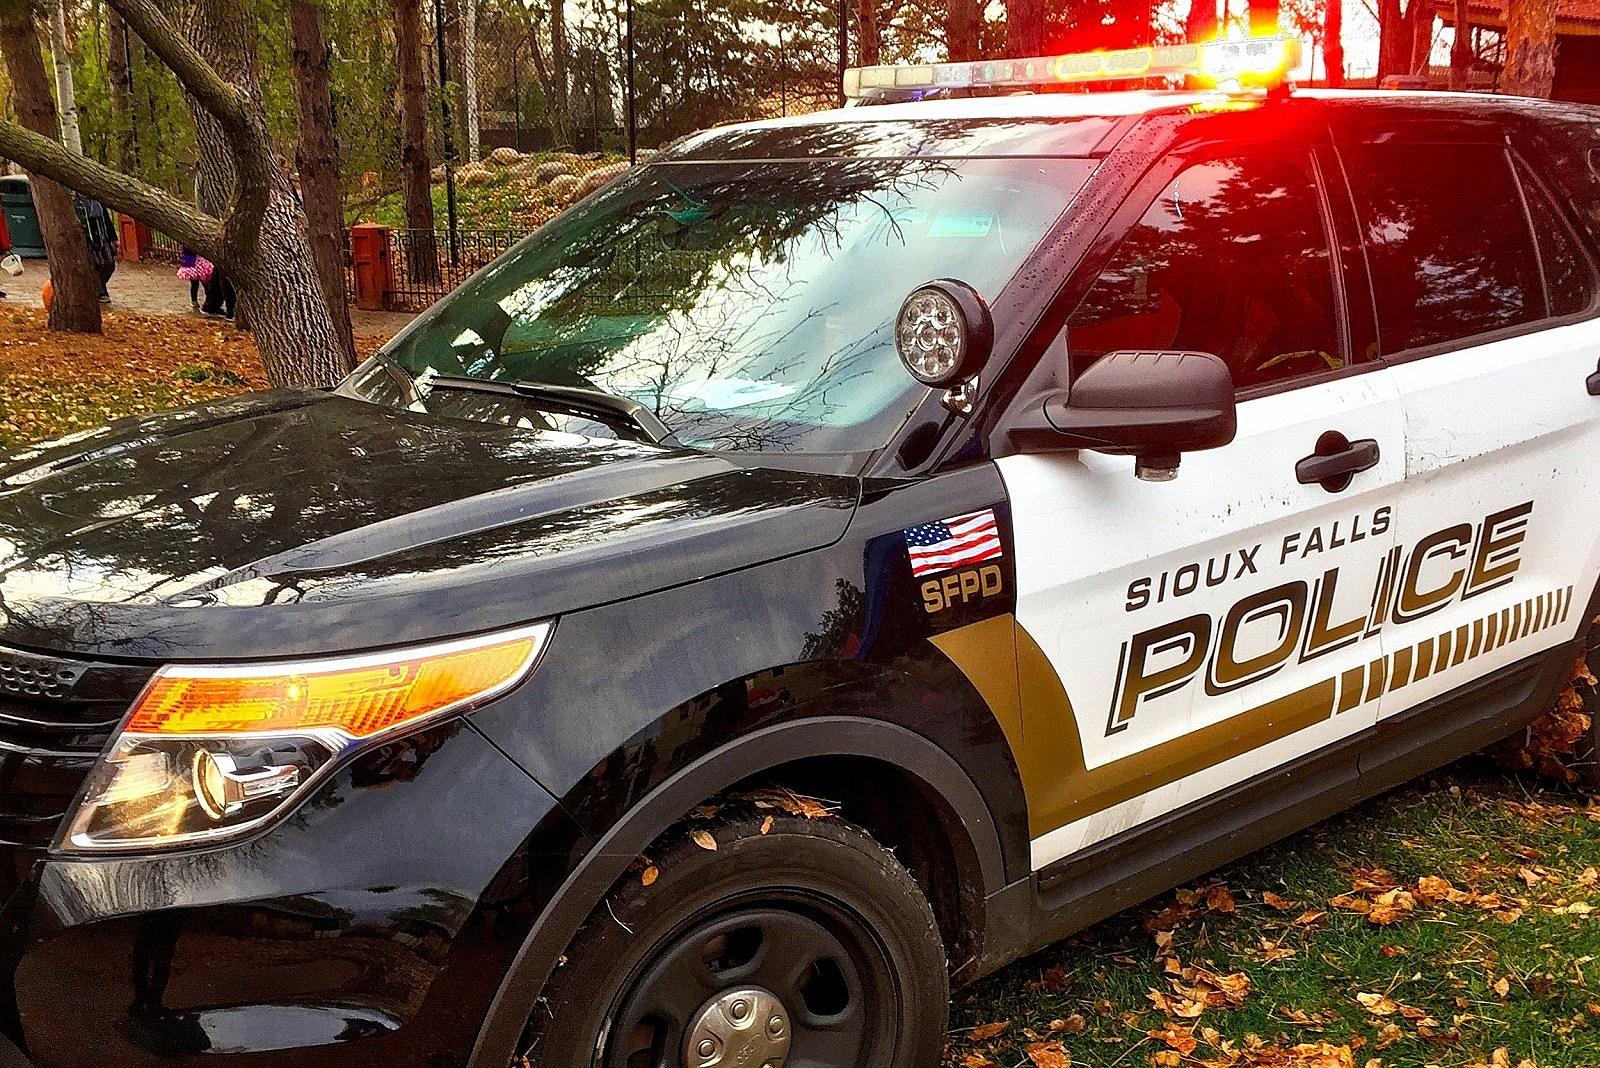 Sioux Falls Police Car